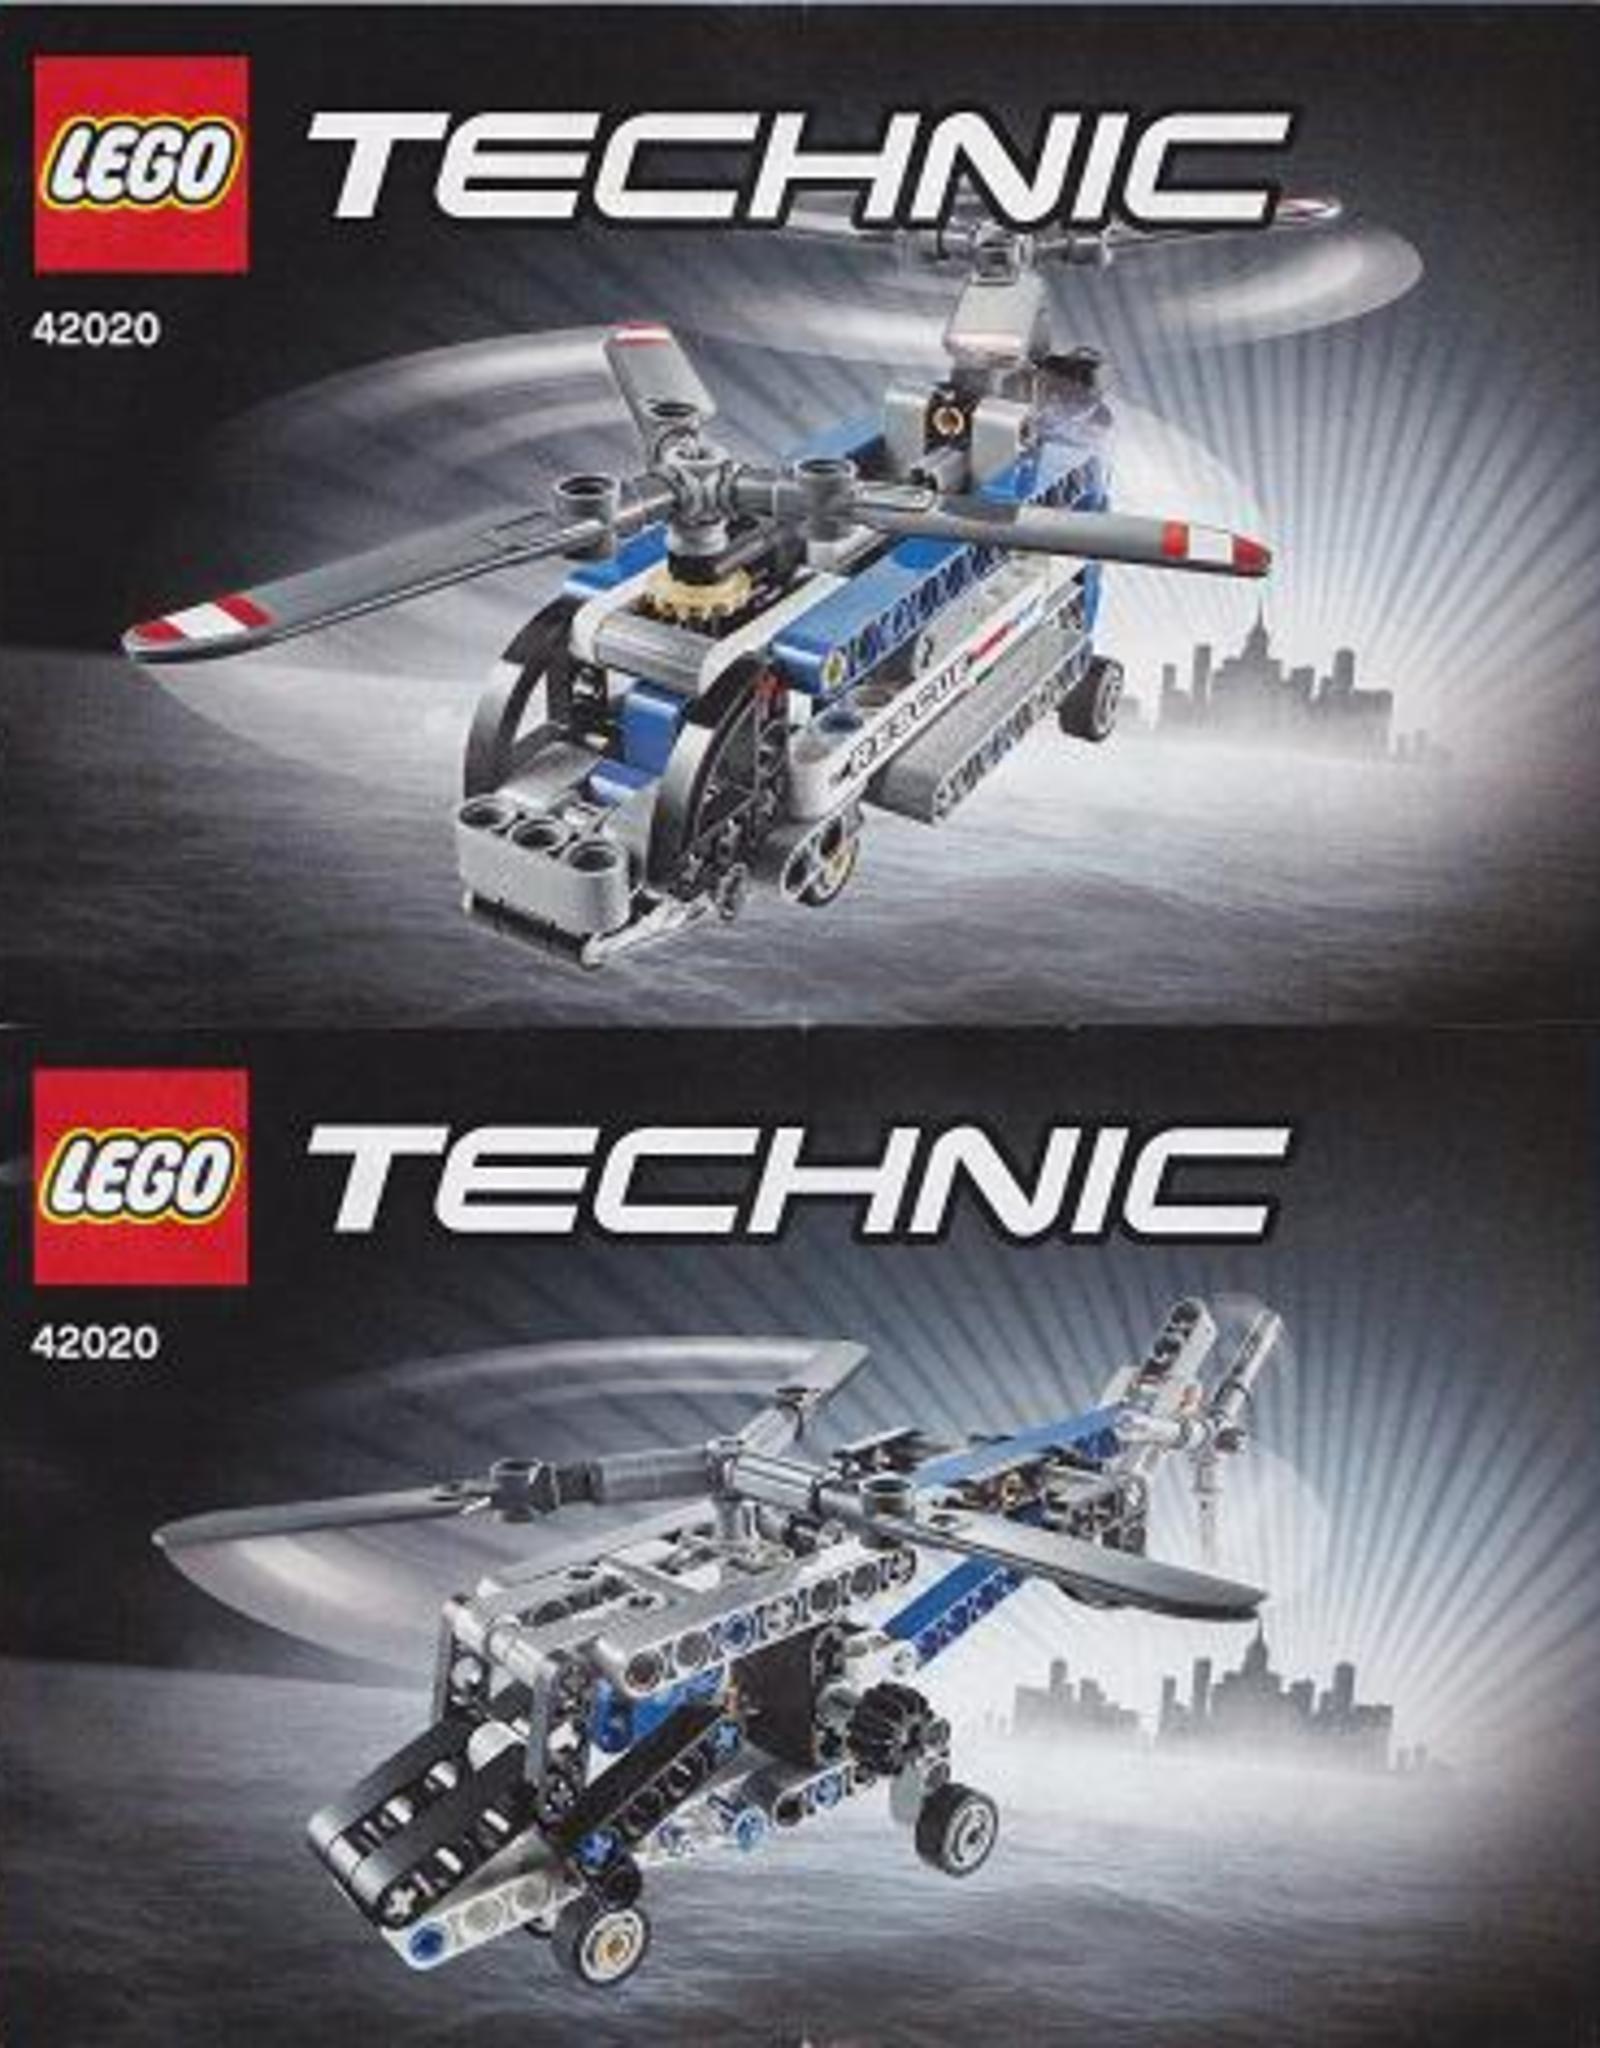 LEGO LEGO 42020 Twin-rotor Helicopter TECHNIC